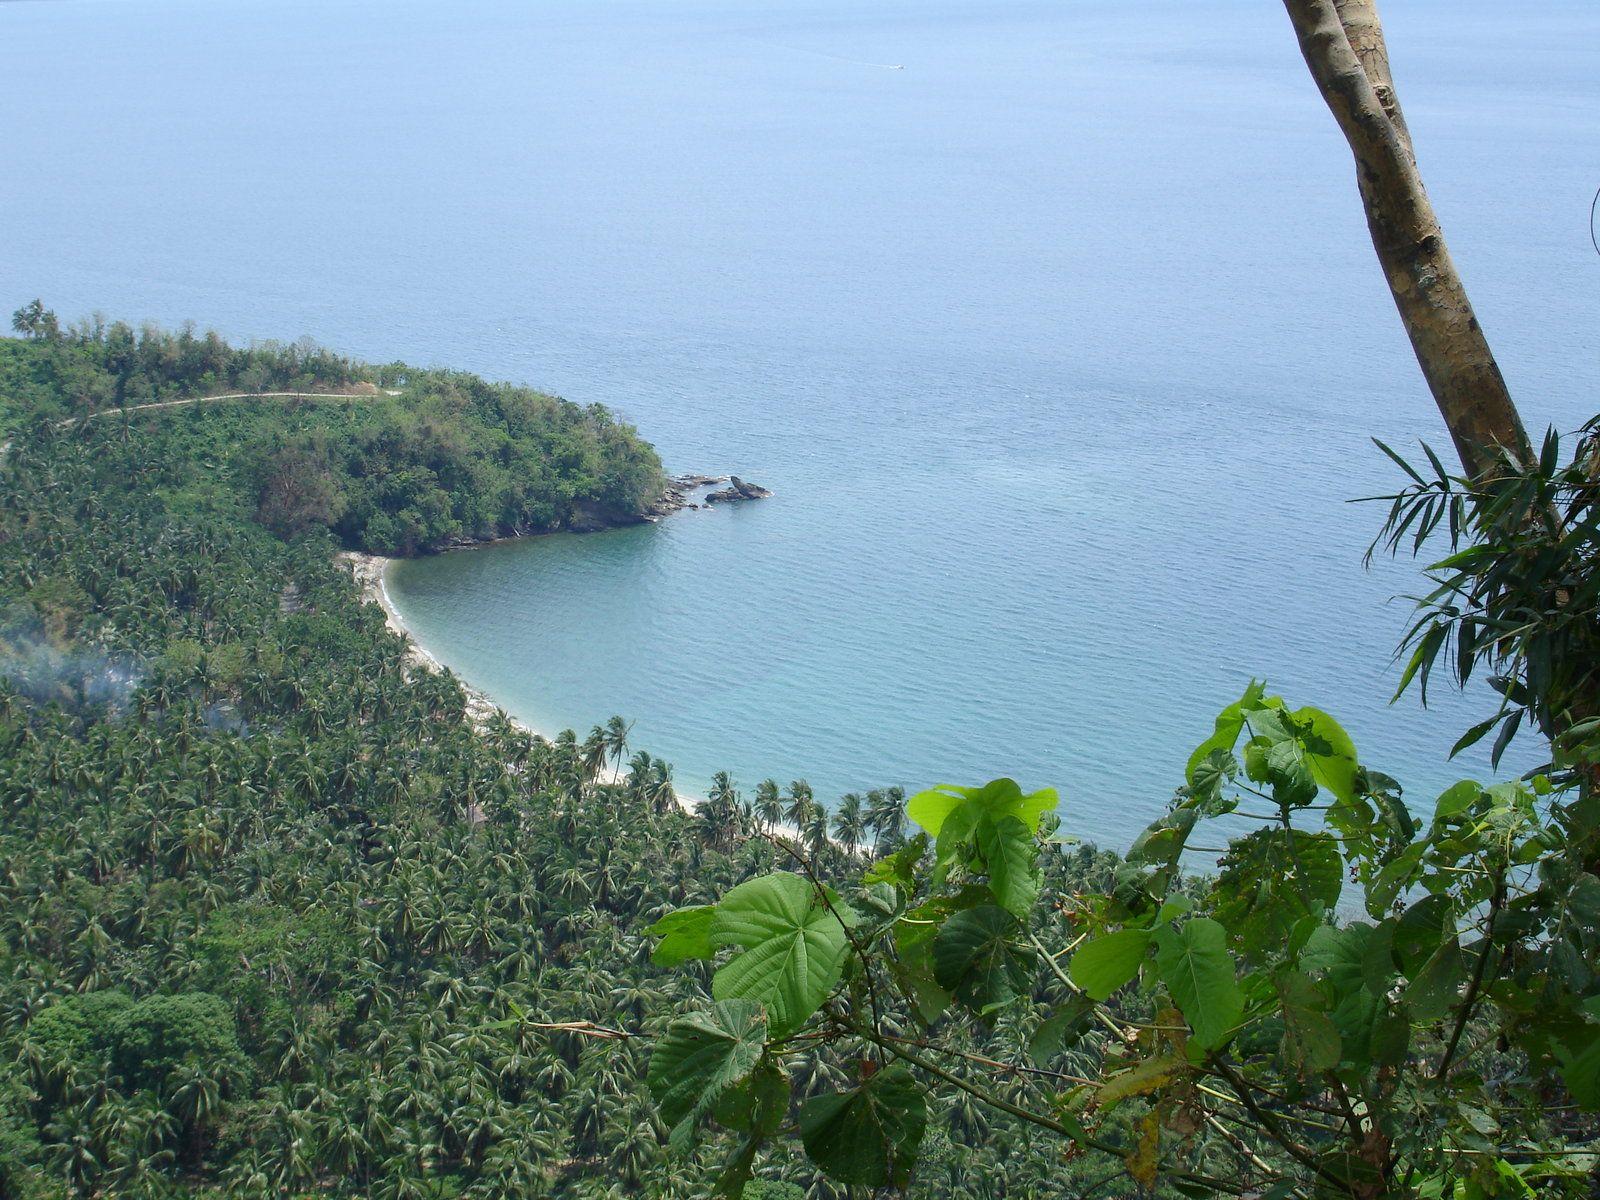 Beautiful ocean views on a paradise island - Mindoro Island, Philippines